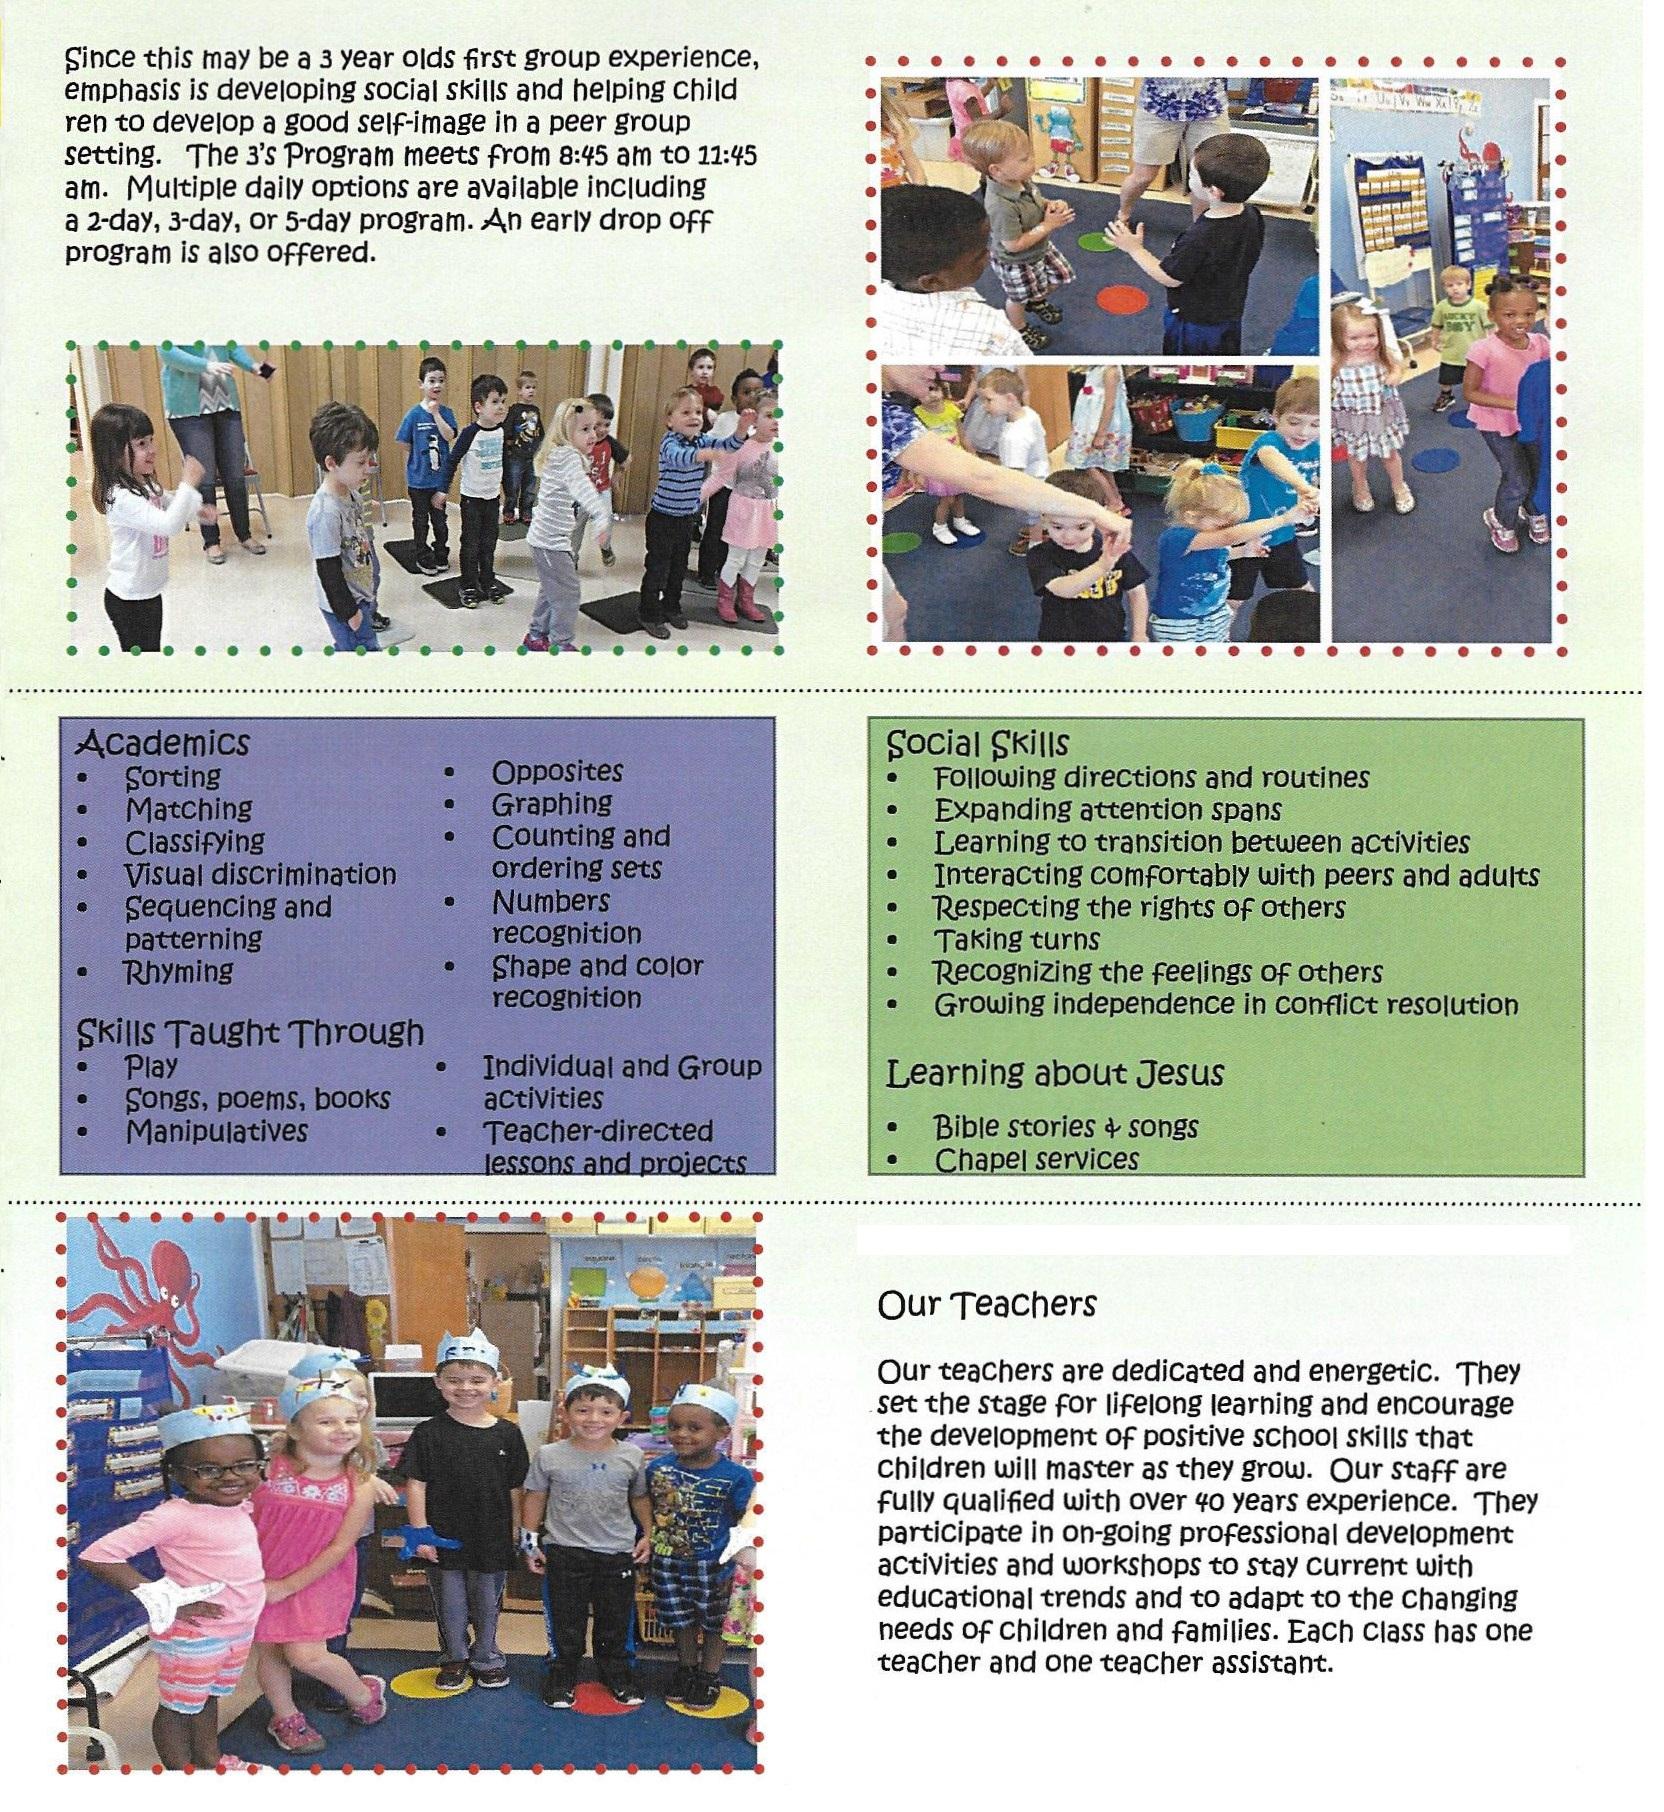 3-Year-Old Program